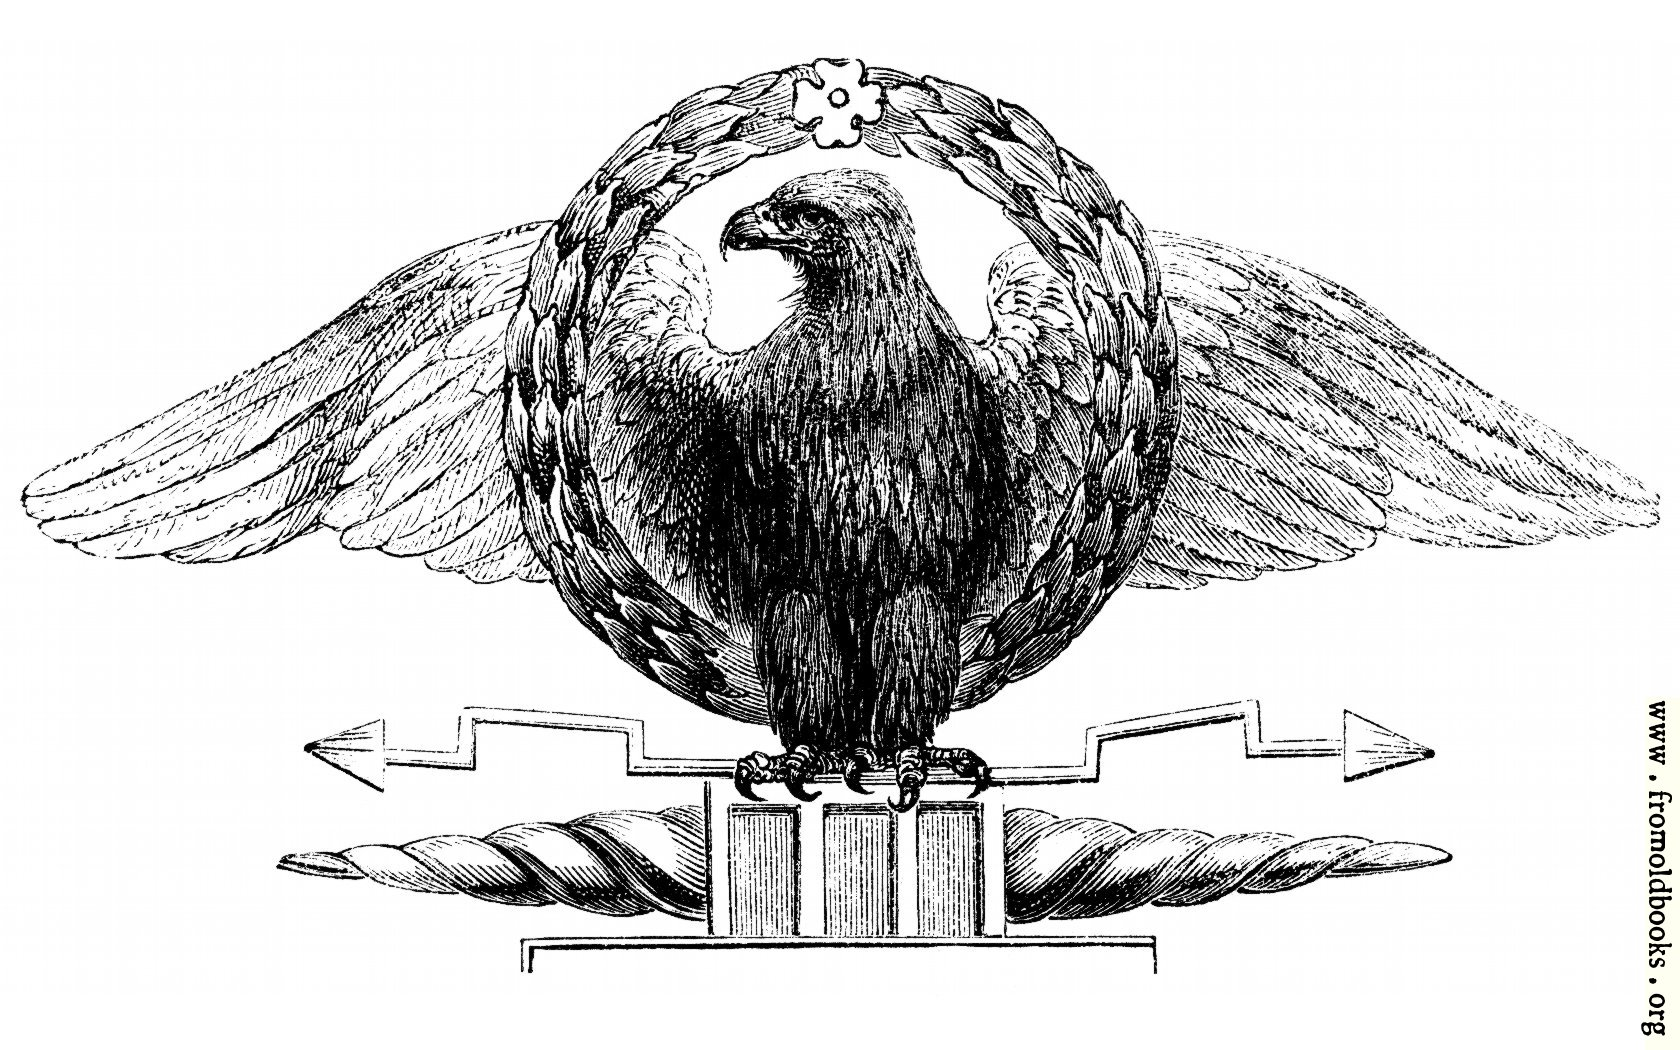 85roman eagle 1680x1050 381k jpg free download buycottarizona Gallery